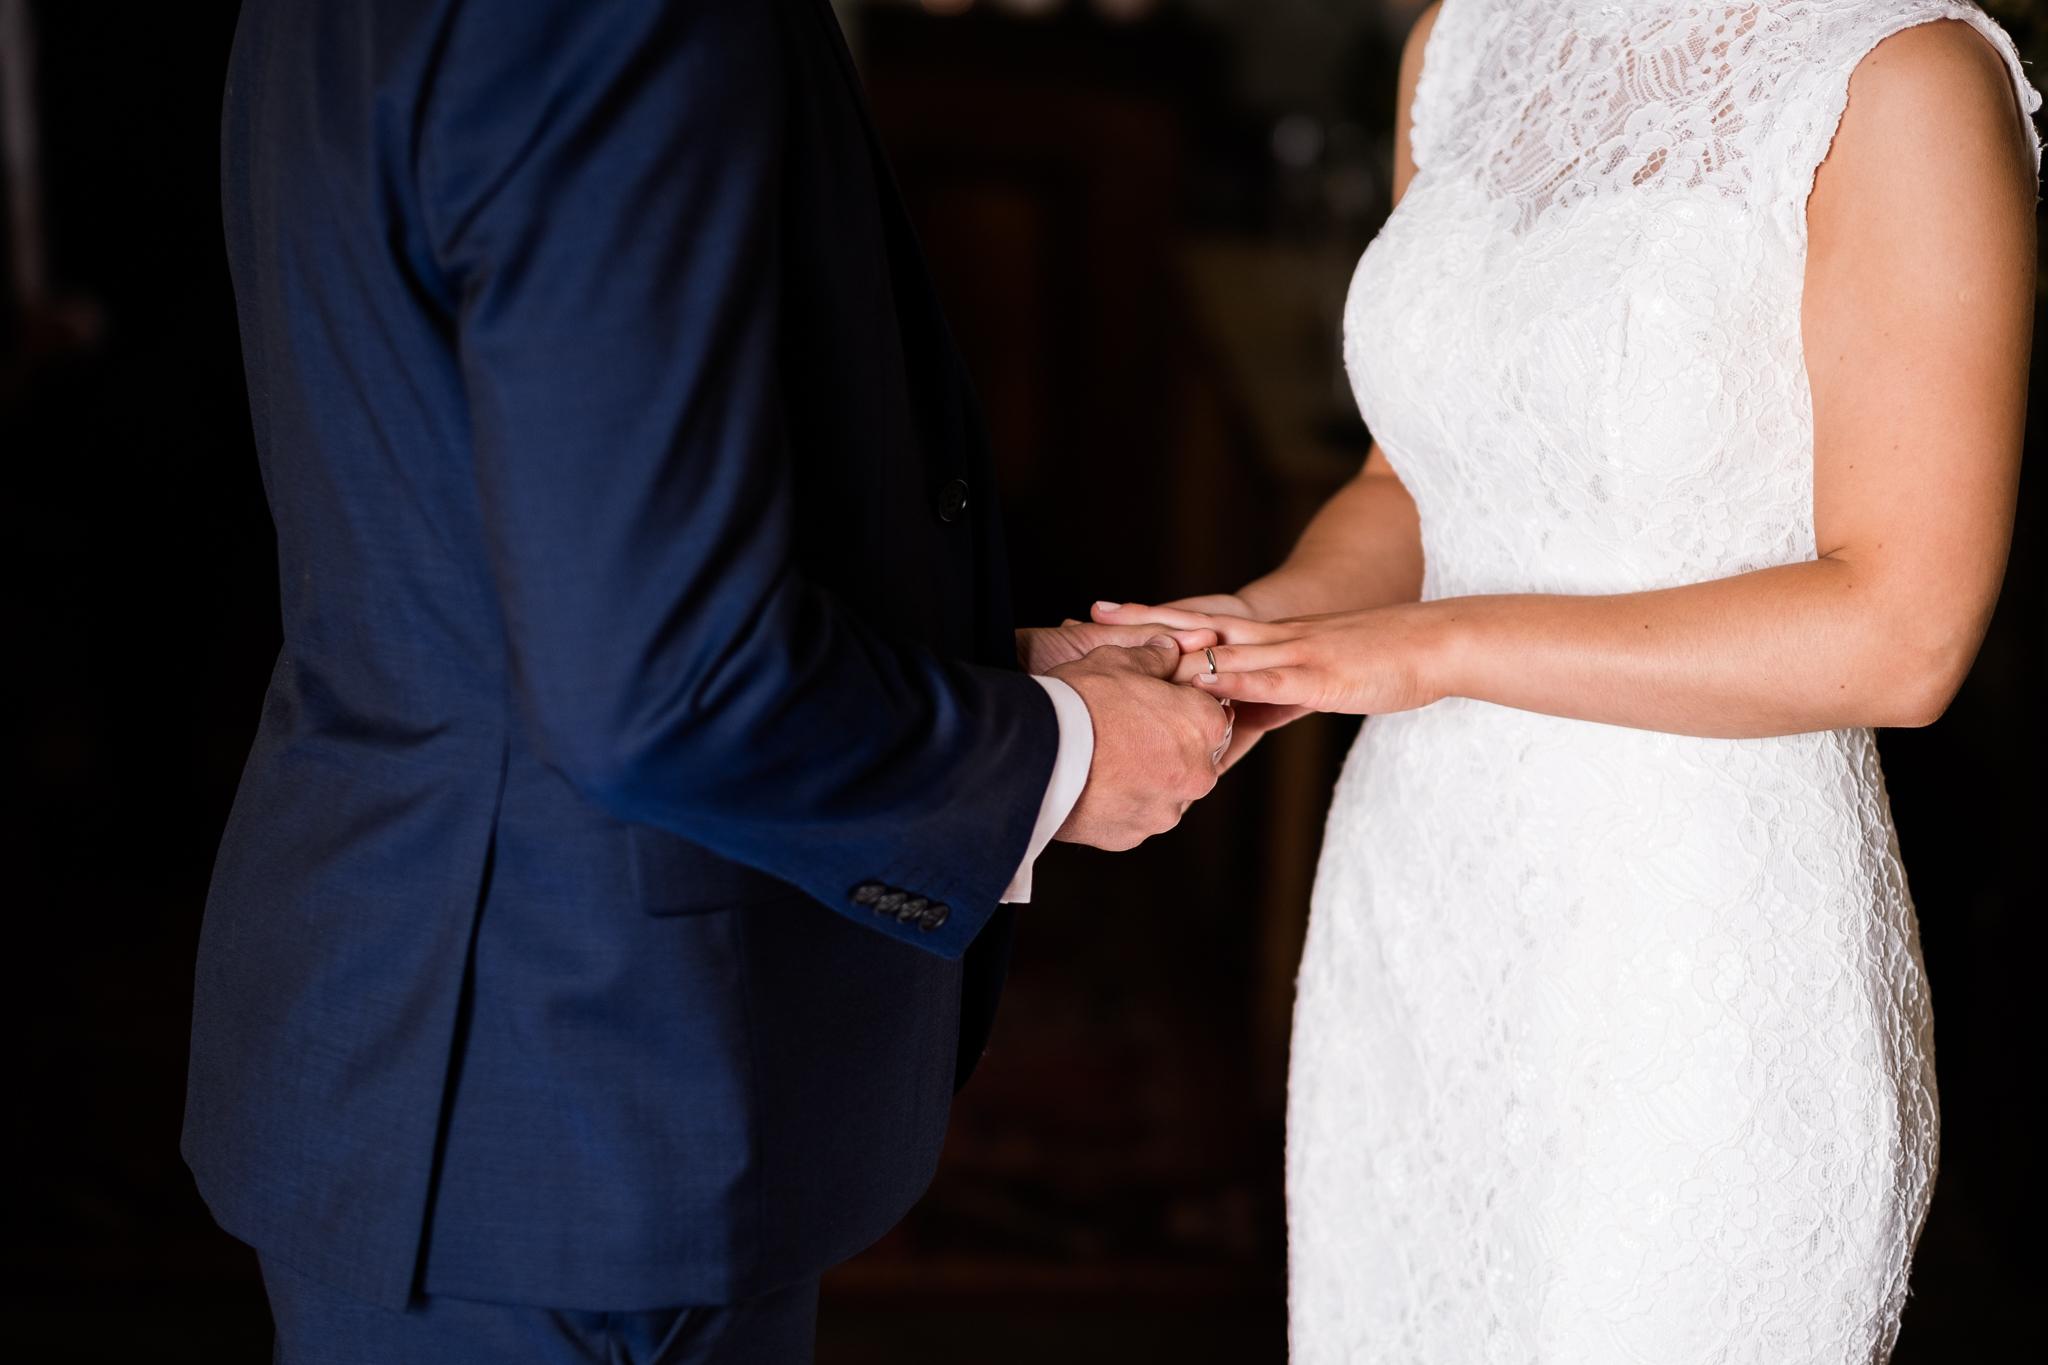 Relaxed Documentary Wedding Photography at The Wizard Inn, Alderley Edge Cheshire - Jenny Harper-32.jpg